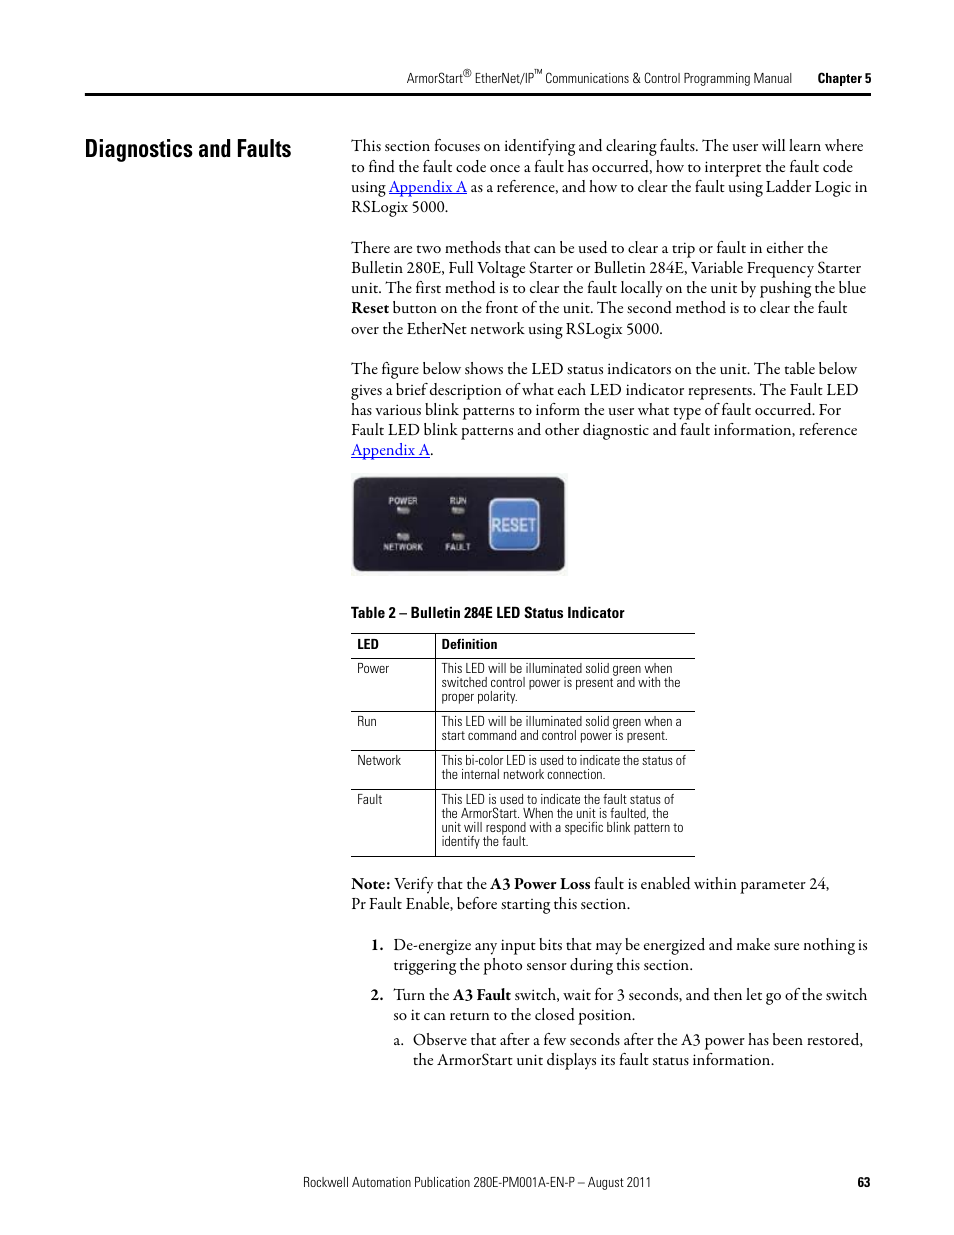 Diagnostics and faults   Rockwell Automation 284E ArmorStart